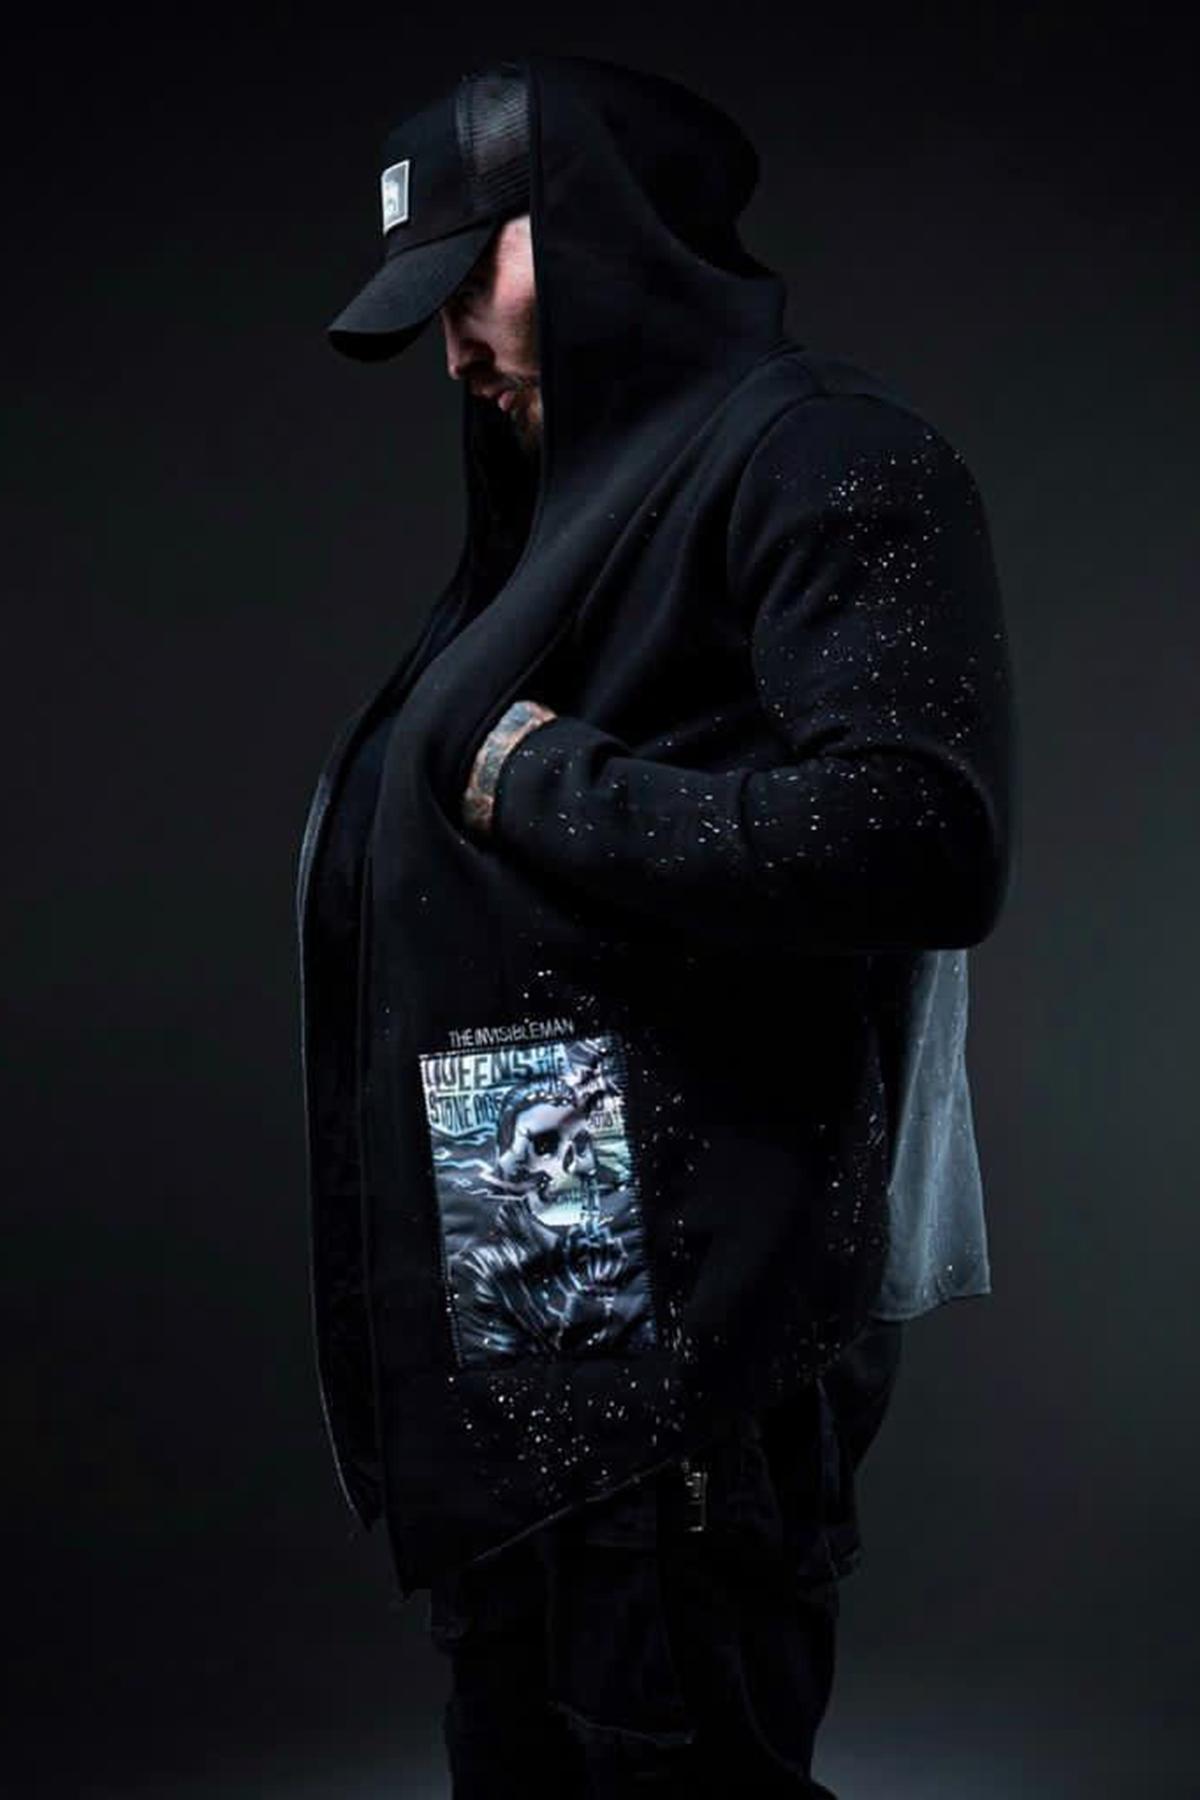 XHAN - Siyah Kamuflaj Baskılı Sweatshirt 1KXE8-44333-02